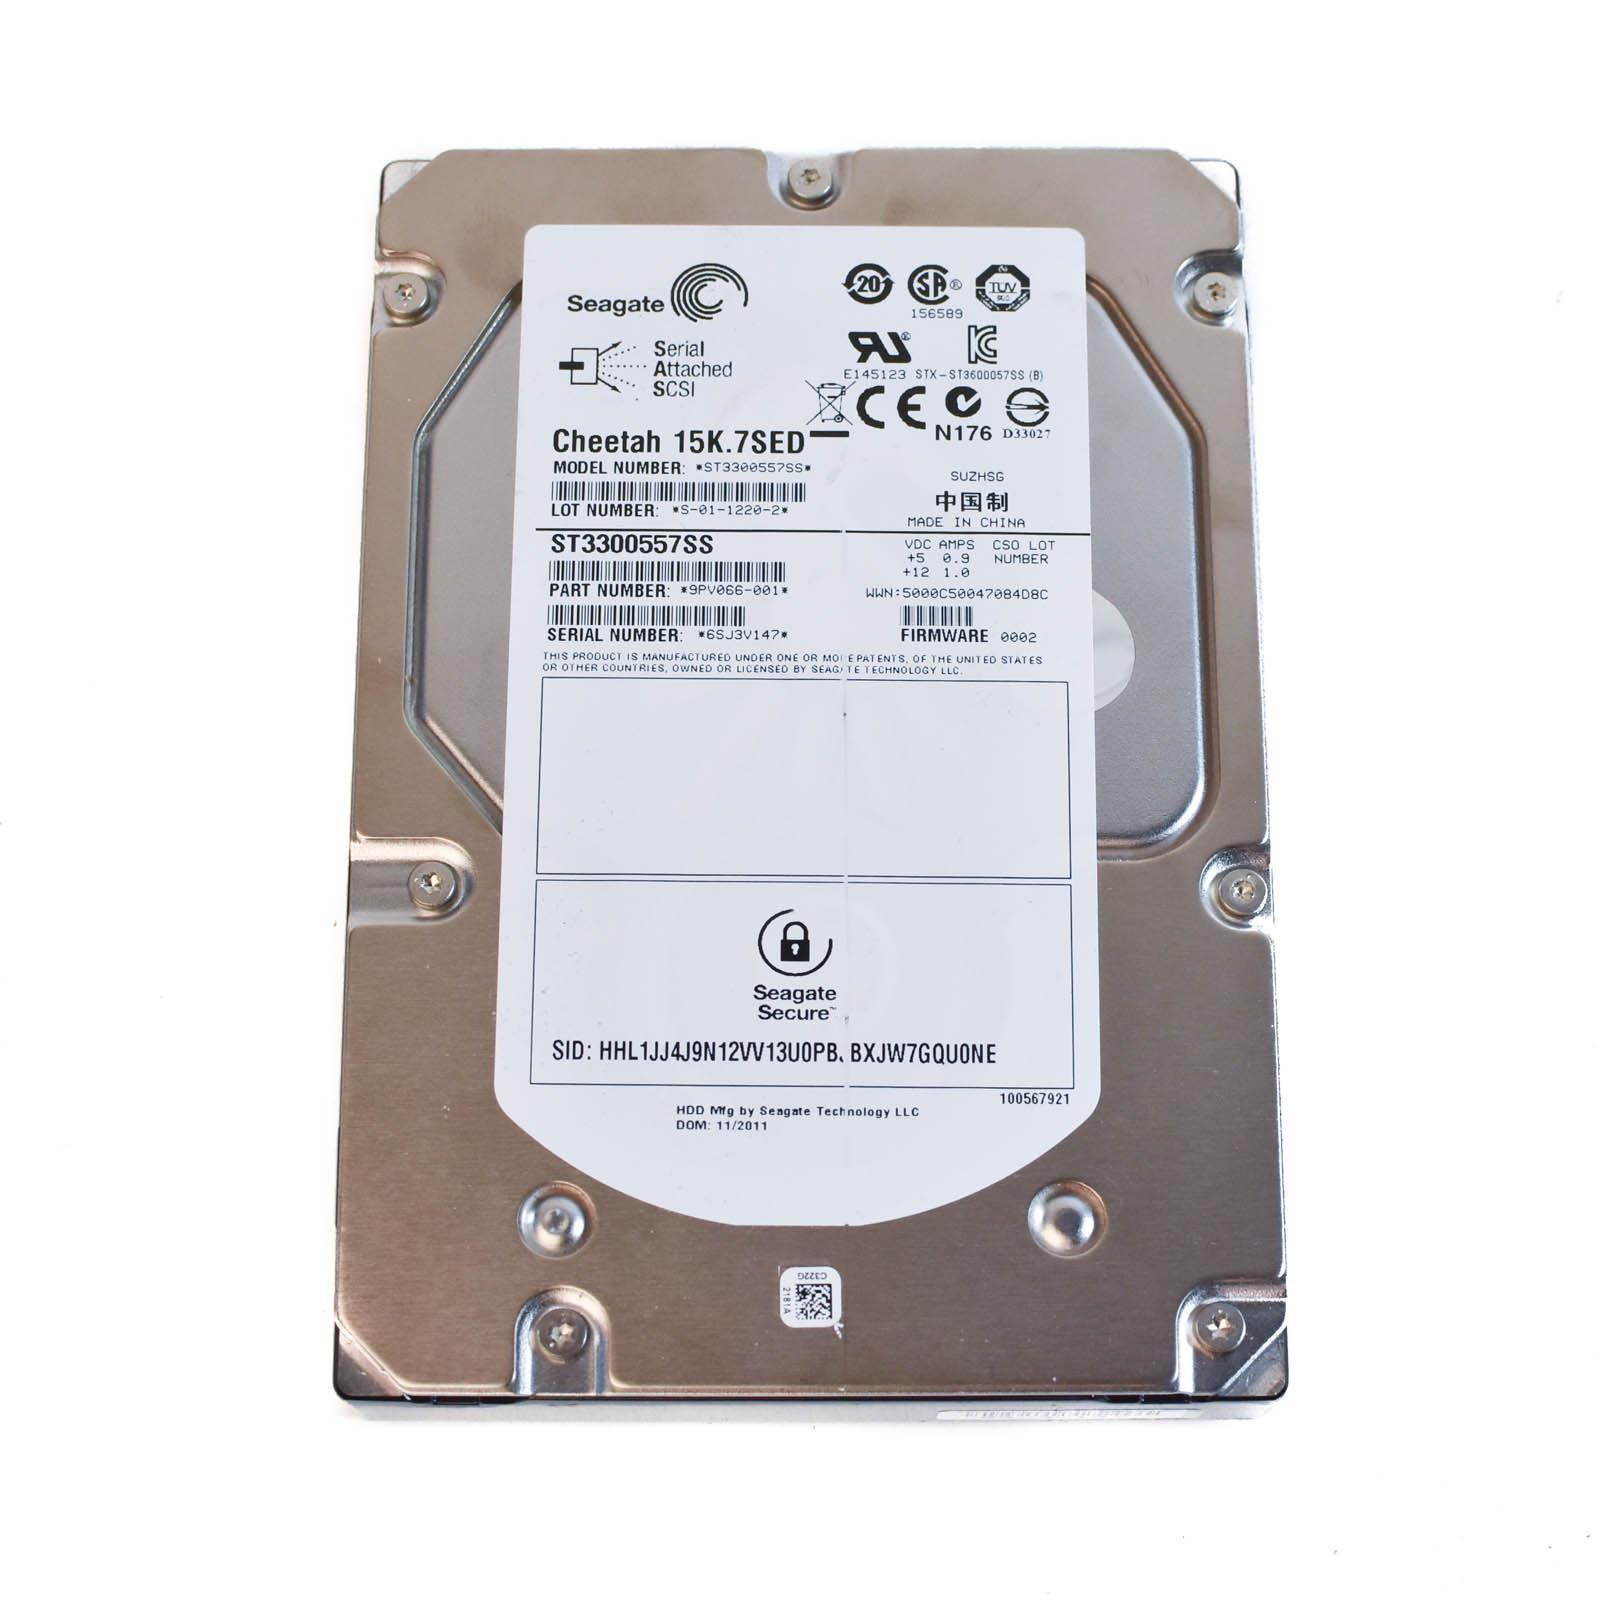 "Seagate 300GB 15K 3.5/"" SAS 6G 16MB Cache Hard Drive Cheetah 15K.7SED ST3300557SS"